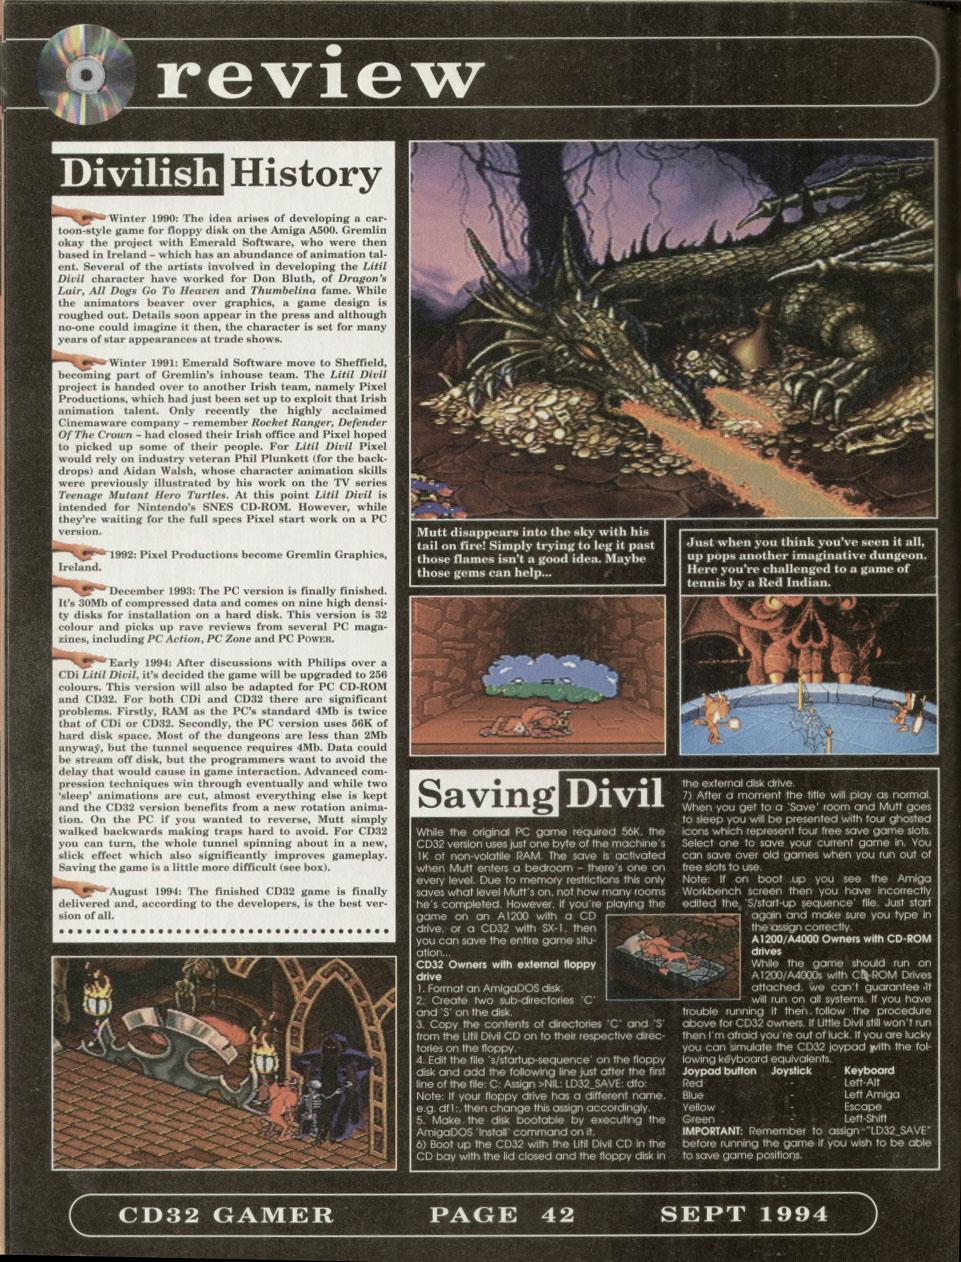 Gremlin Graphics Ireland History